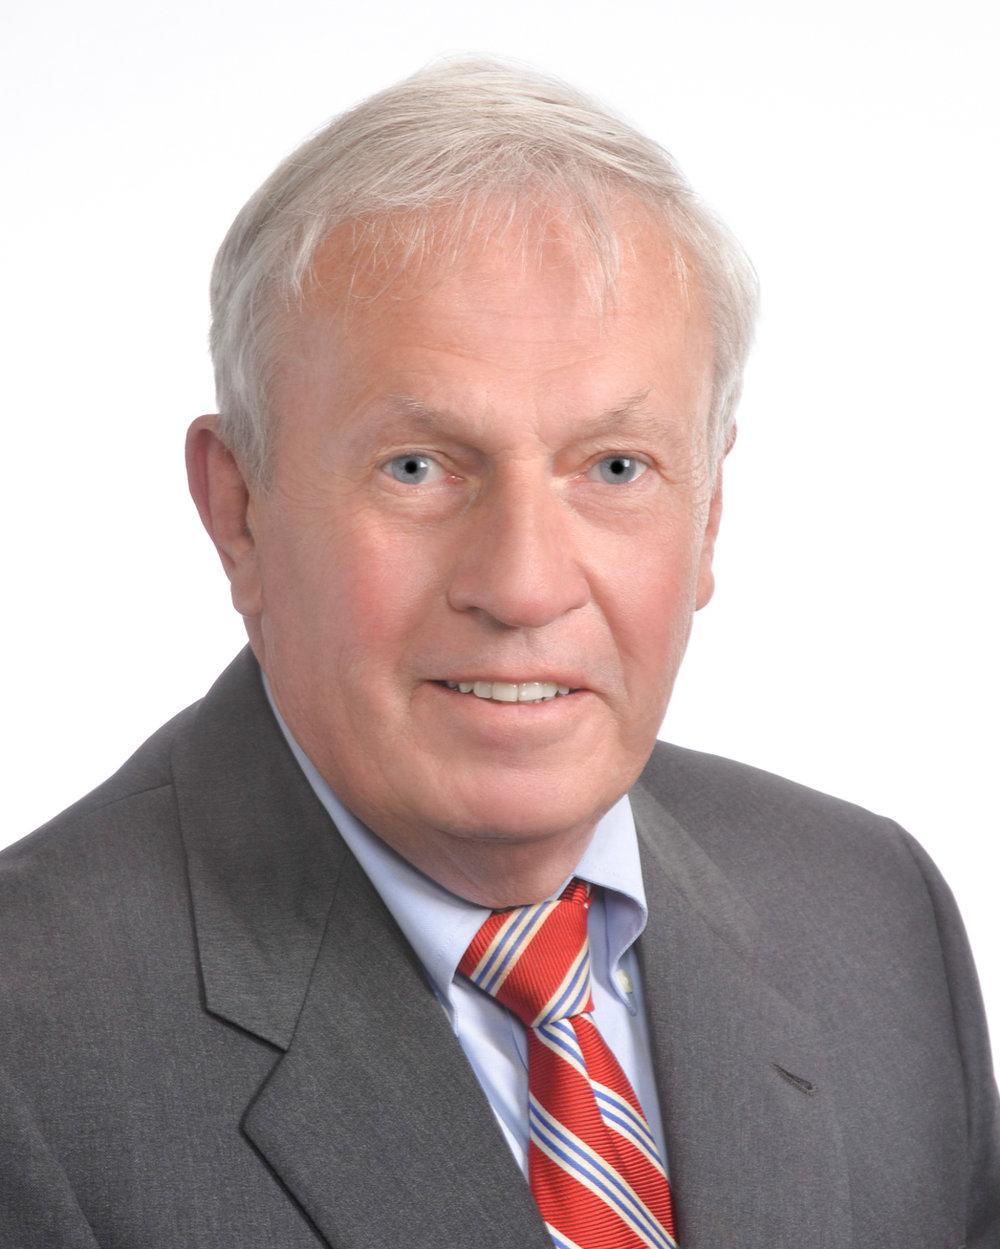 David W. Gray - Director